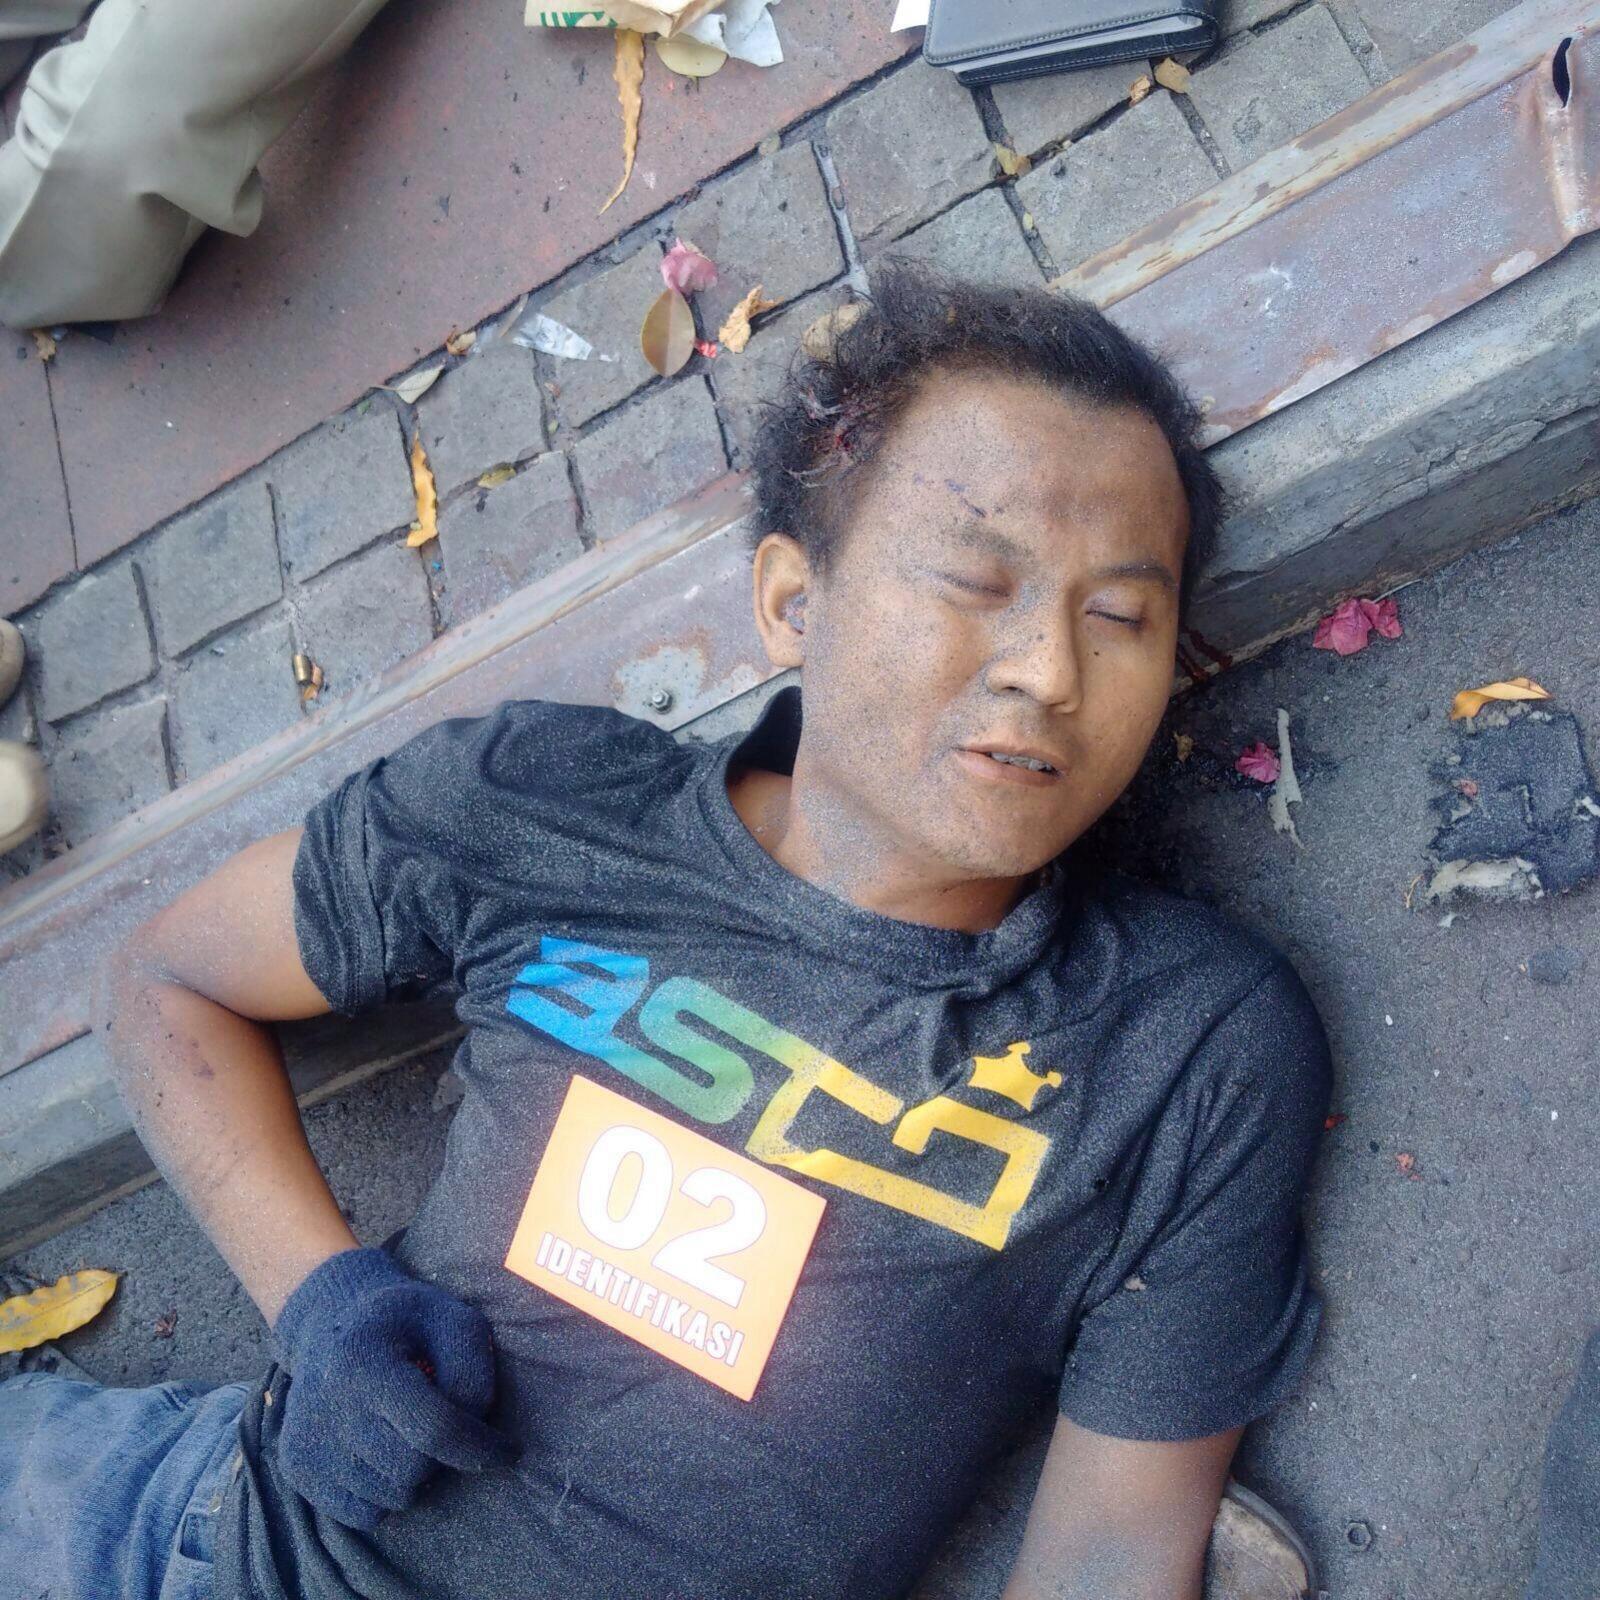 Terduga Pelaku Teror Bom Sarinah Membuat Sedikitnya Warga Jawa